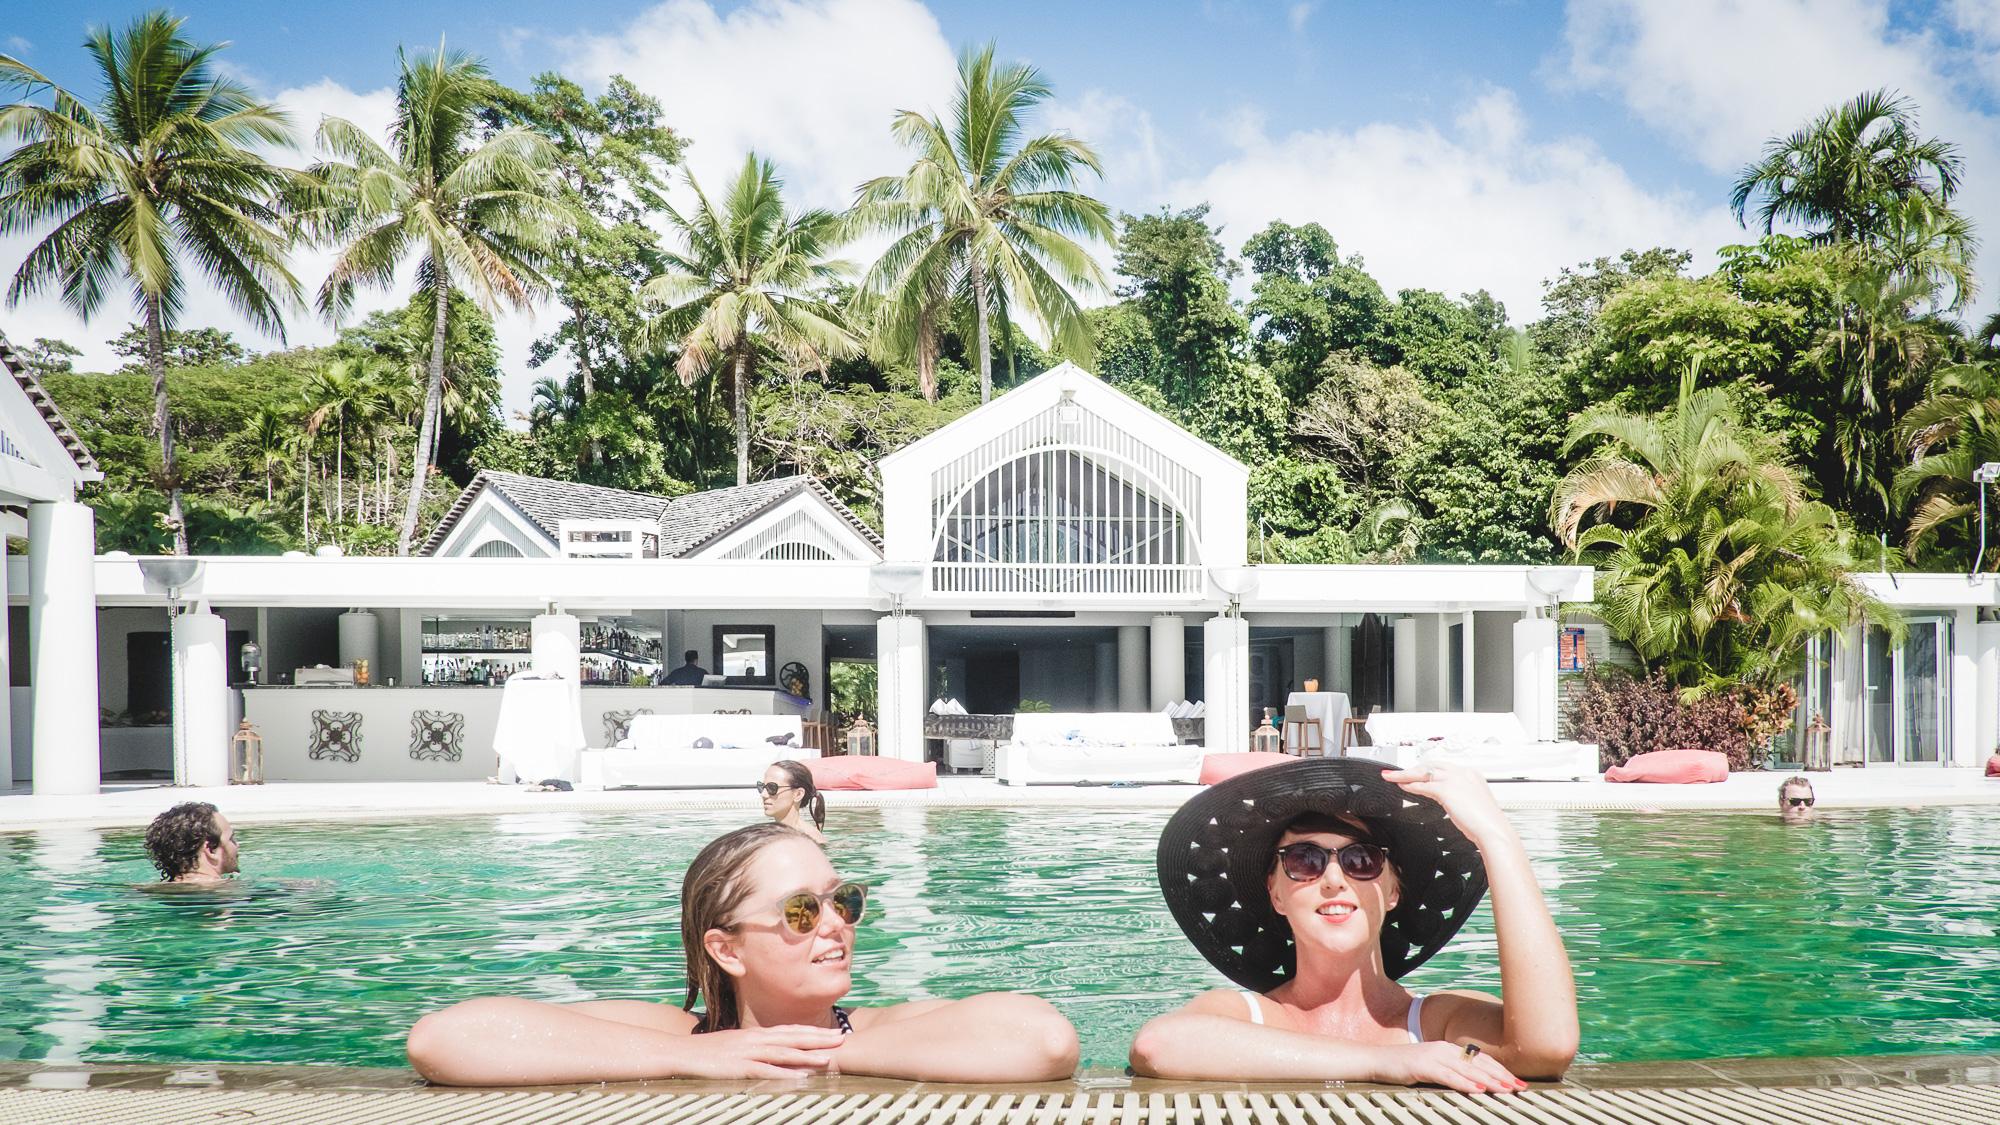 In the pool at Elandra Resort, Mission Beach